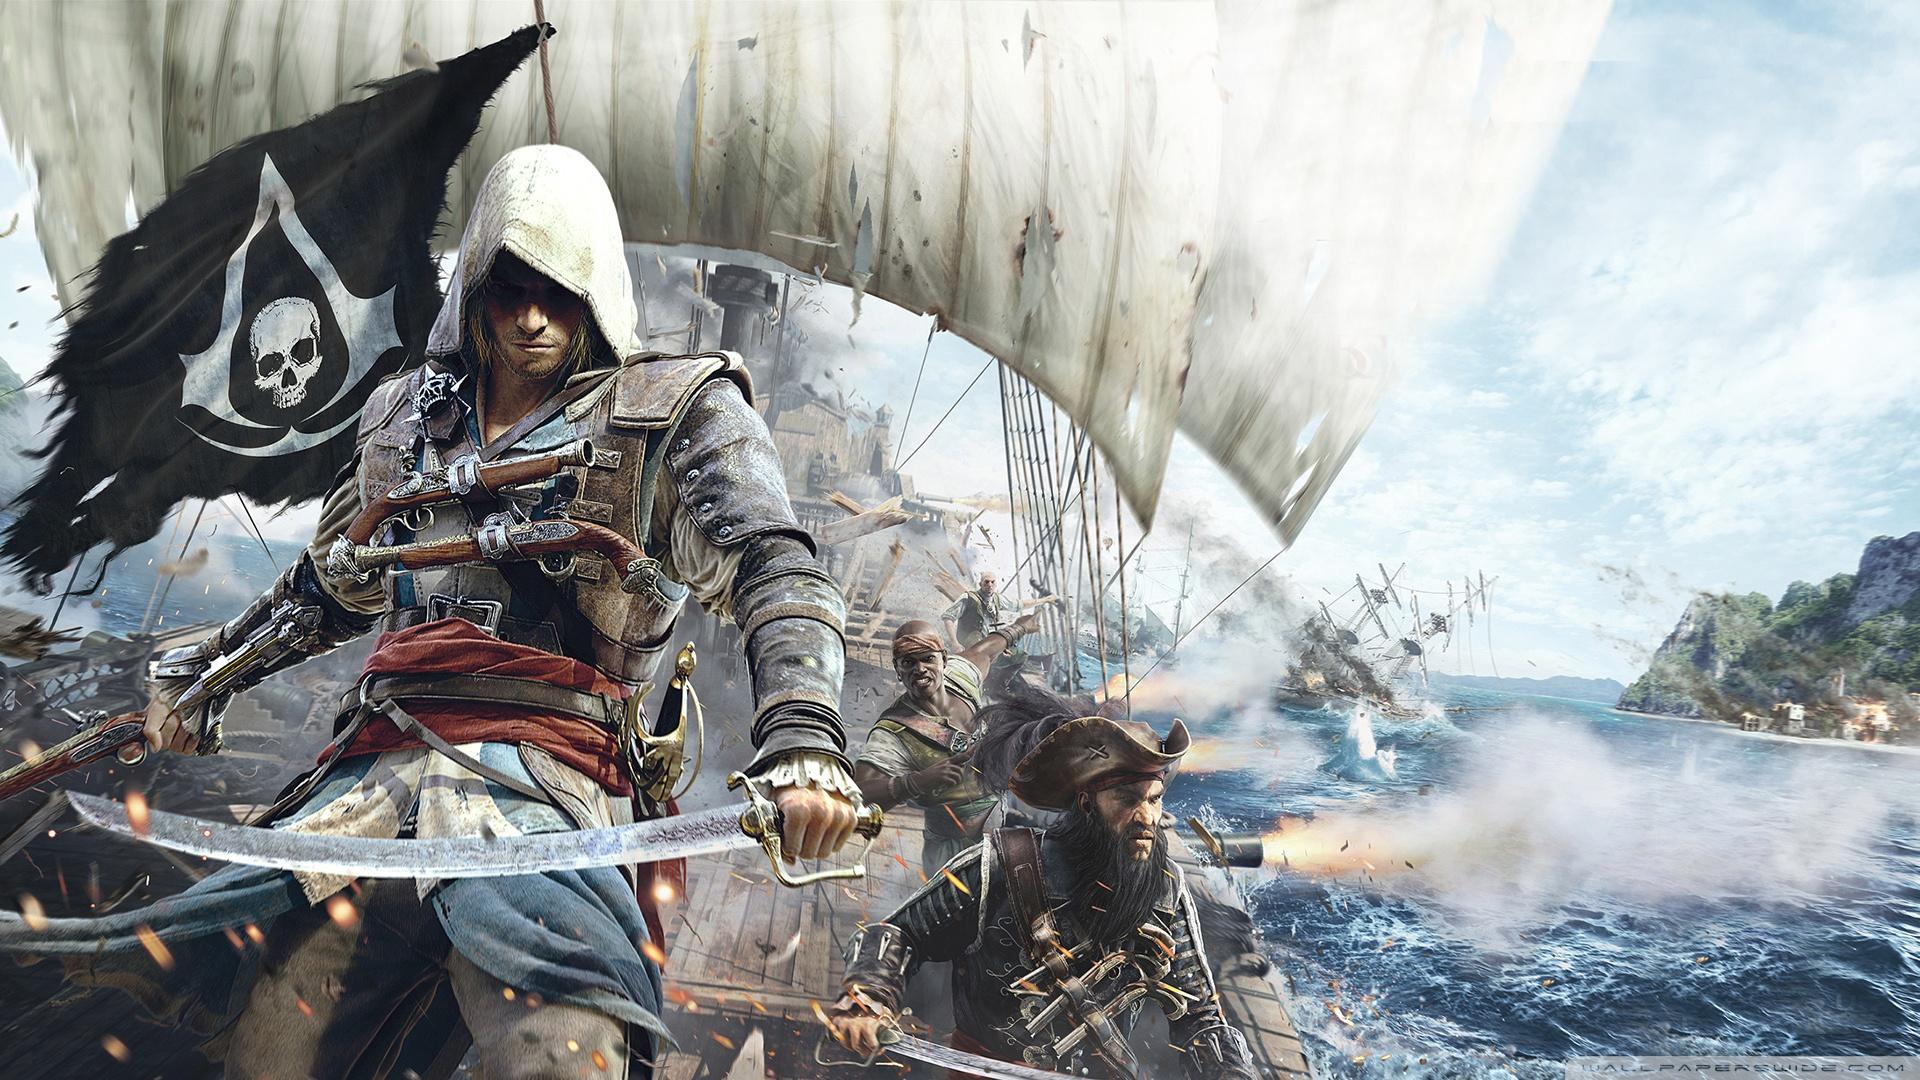 55 Assassins Creed IV Wallpapers   Download at WallpaperBro 1920x1080